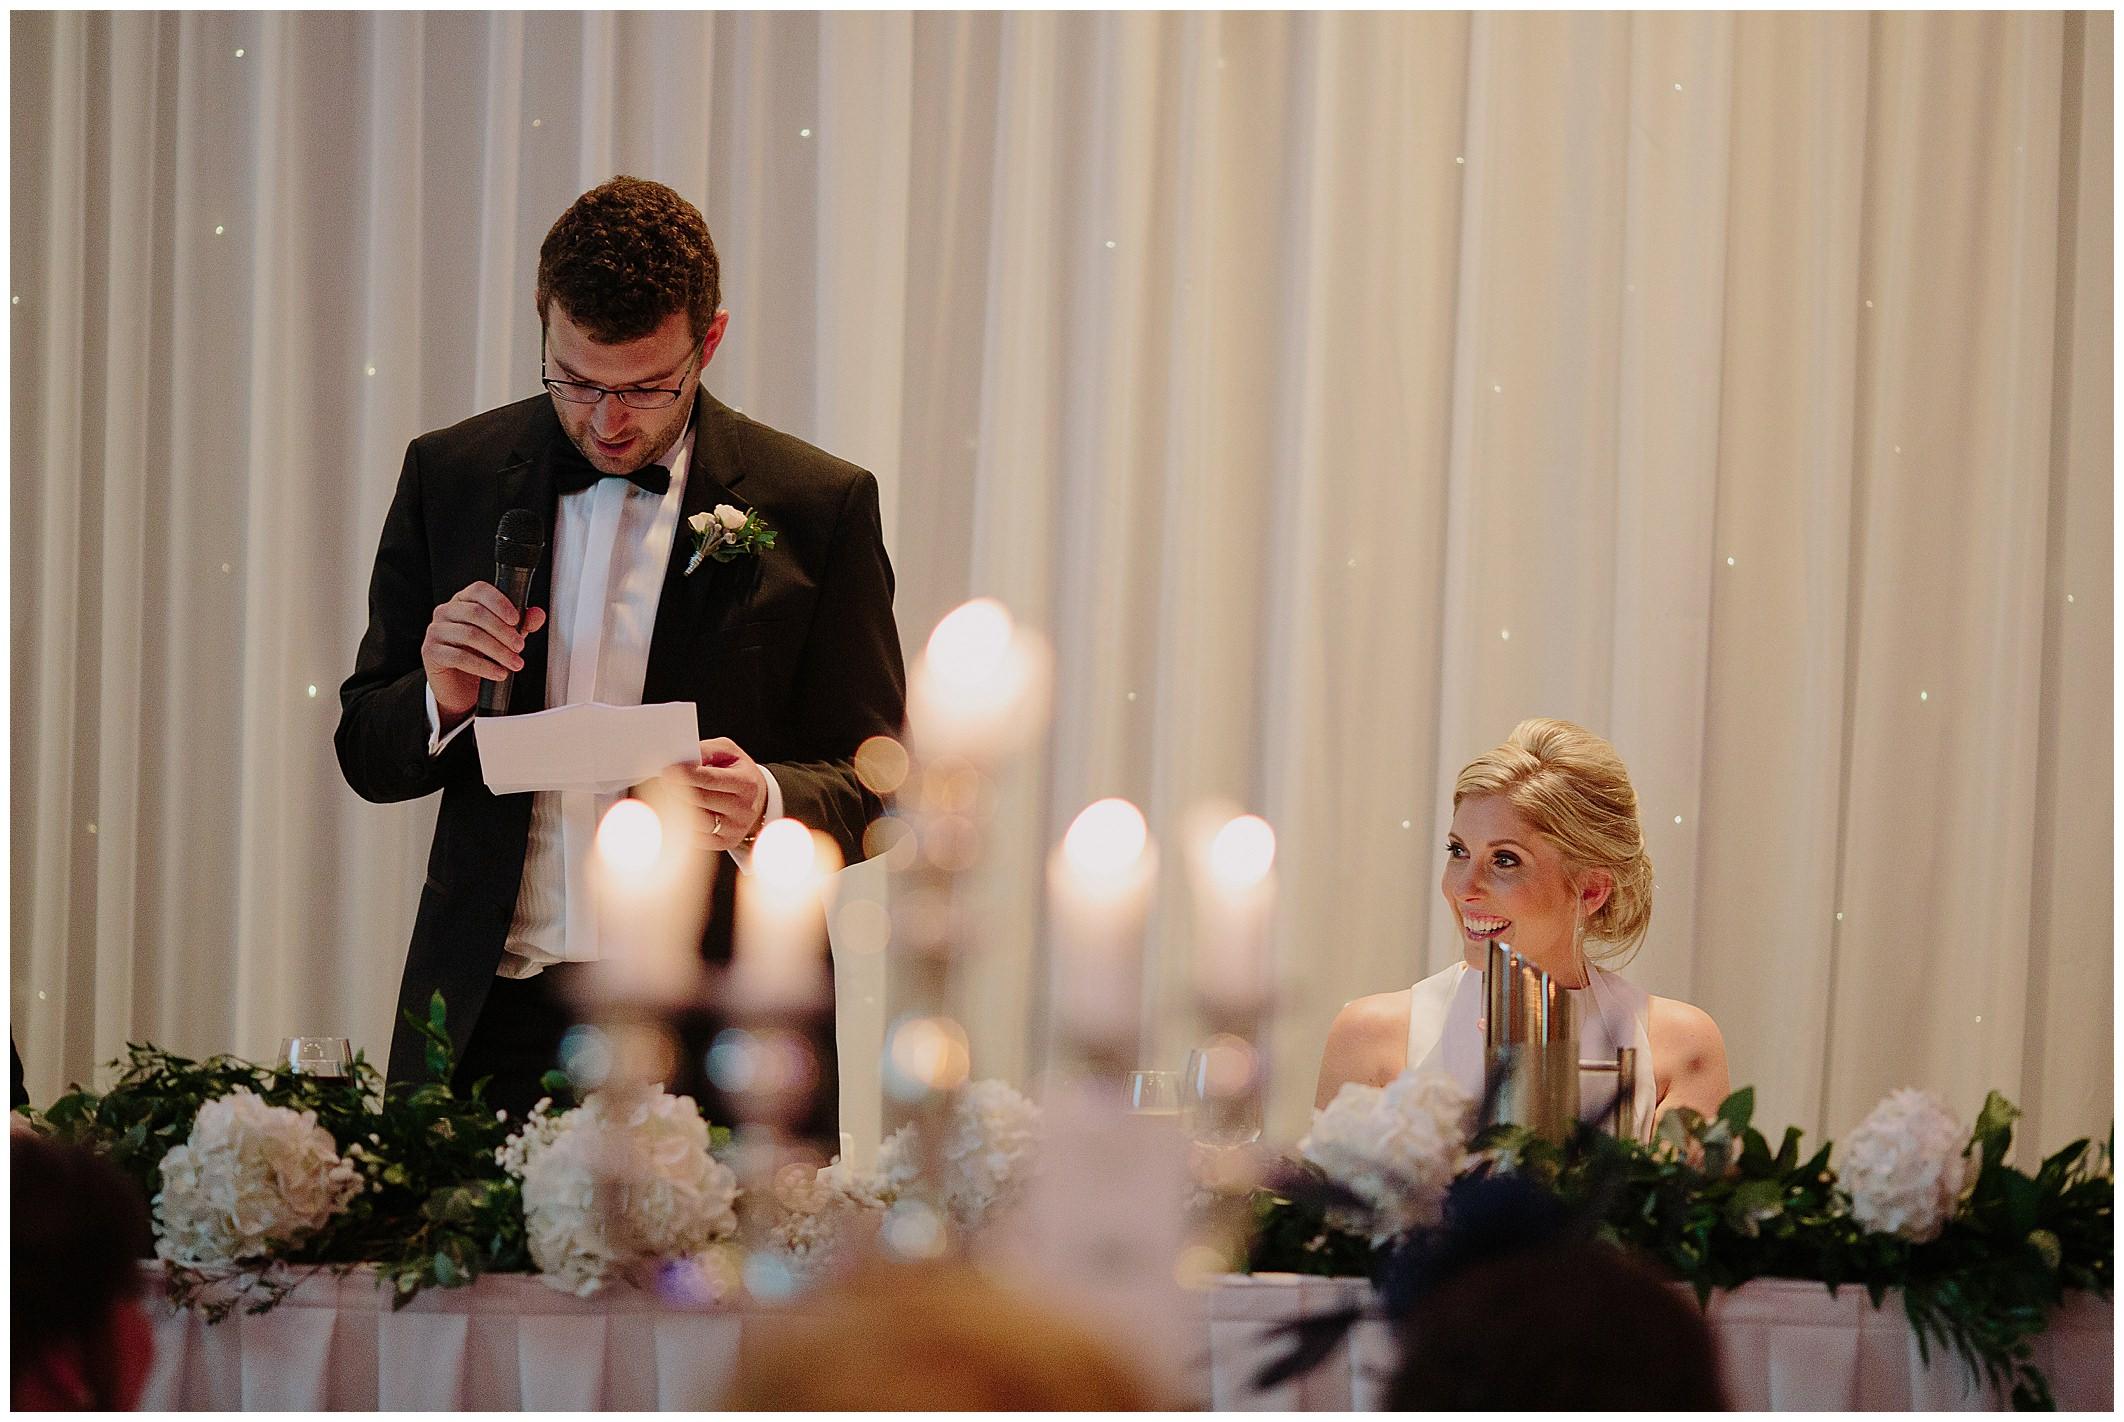 farnham-estate-wedding-jude-browne-photography_0181.jpg